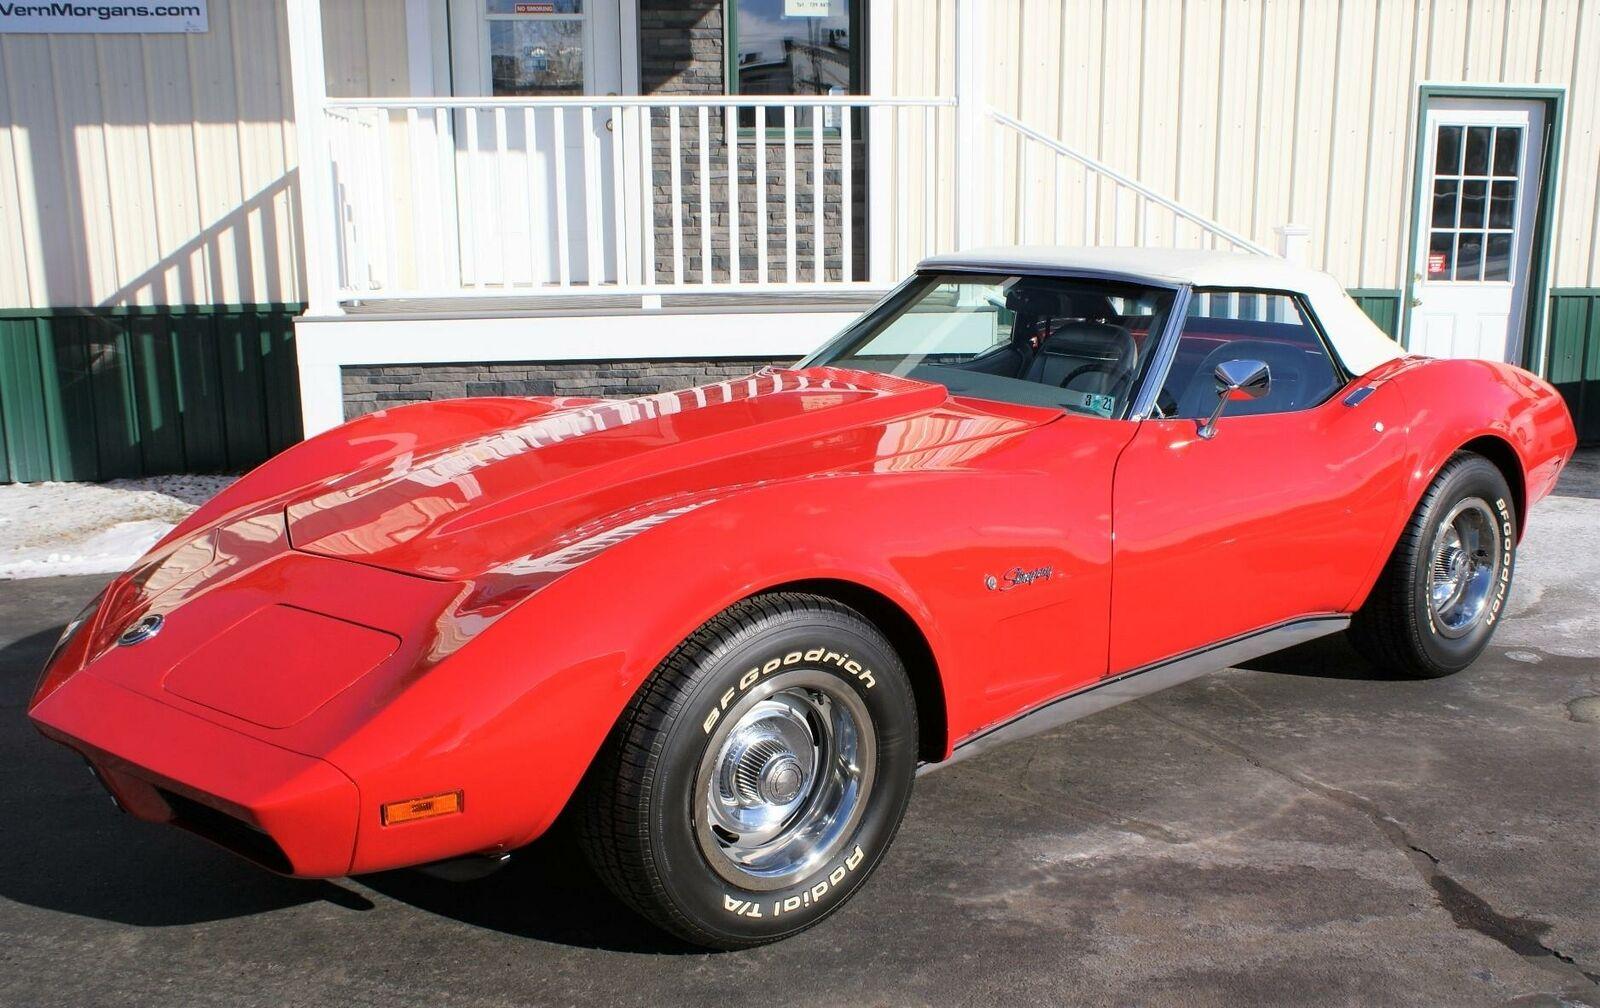 1974 Red Chevrolet Corvette  L82   C3 Corvette Photo 1